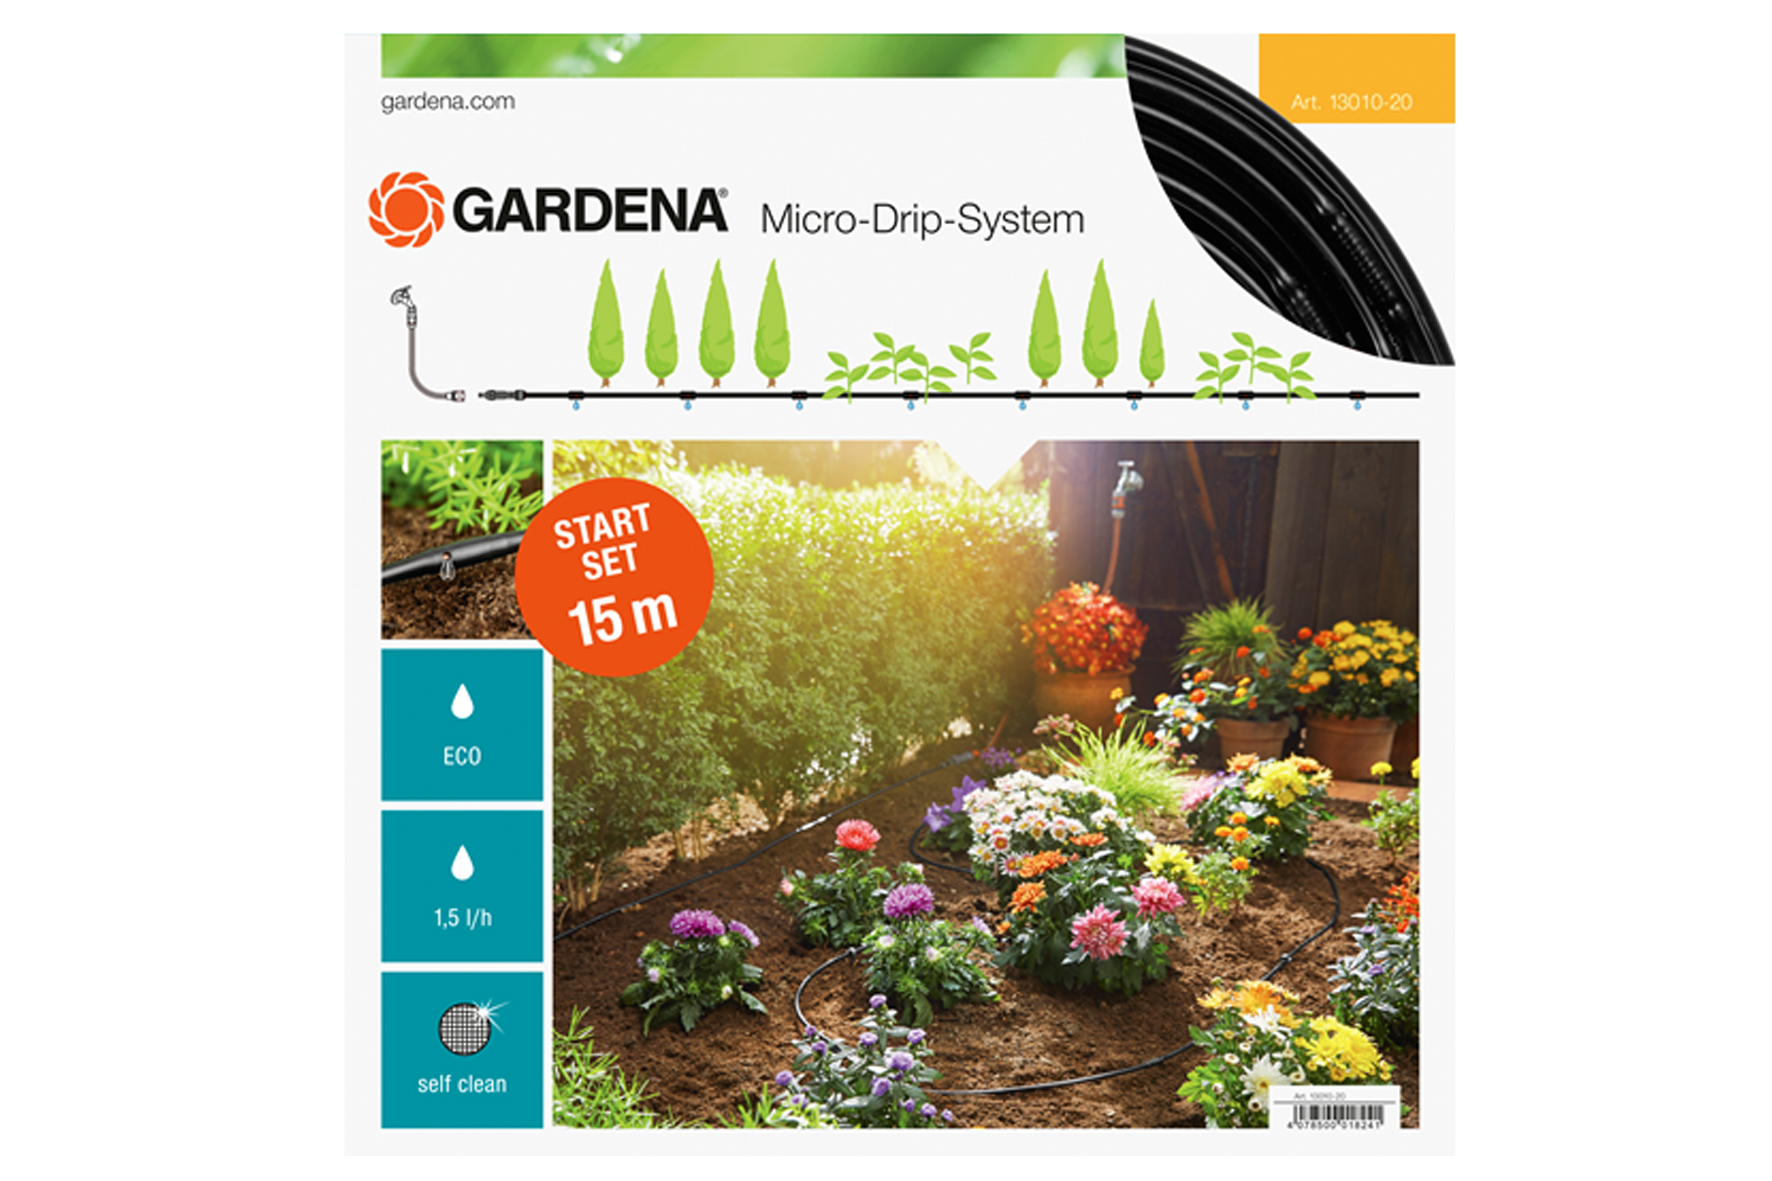 tuyau microdrip gardena - kit plantes ligne 15m. achat en ligne ou